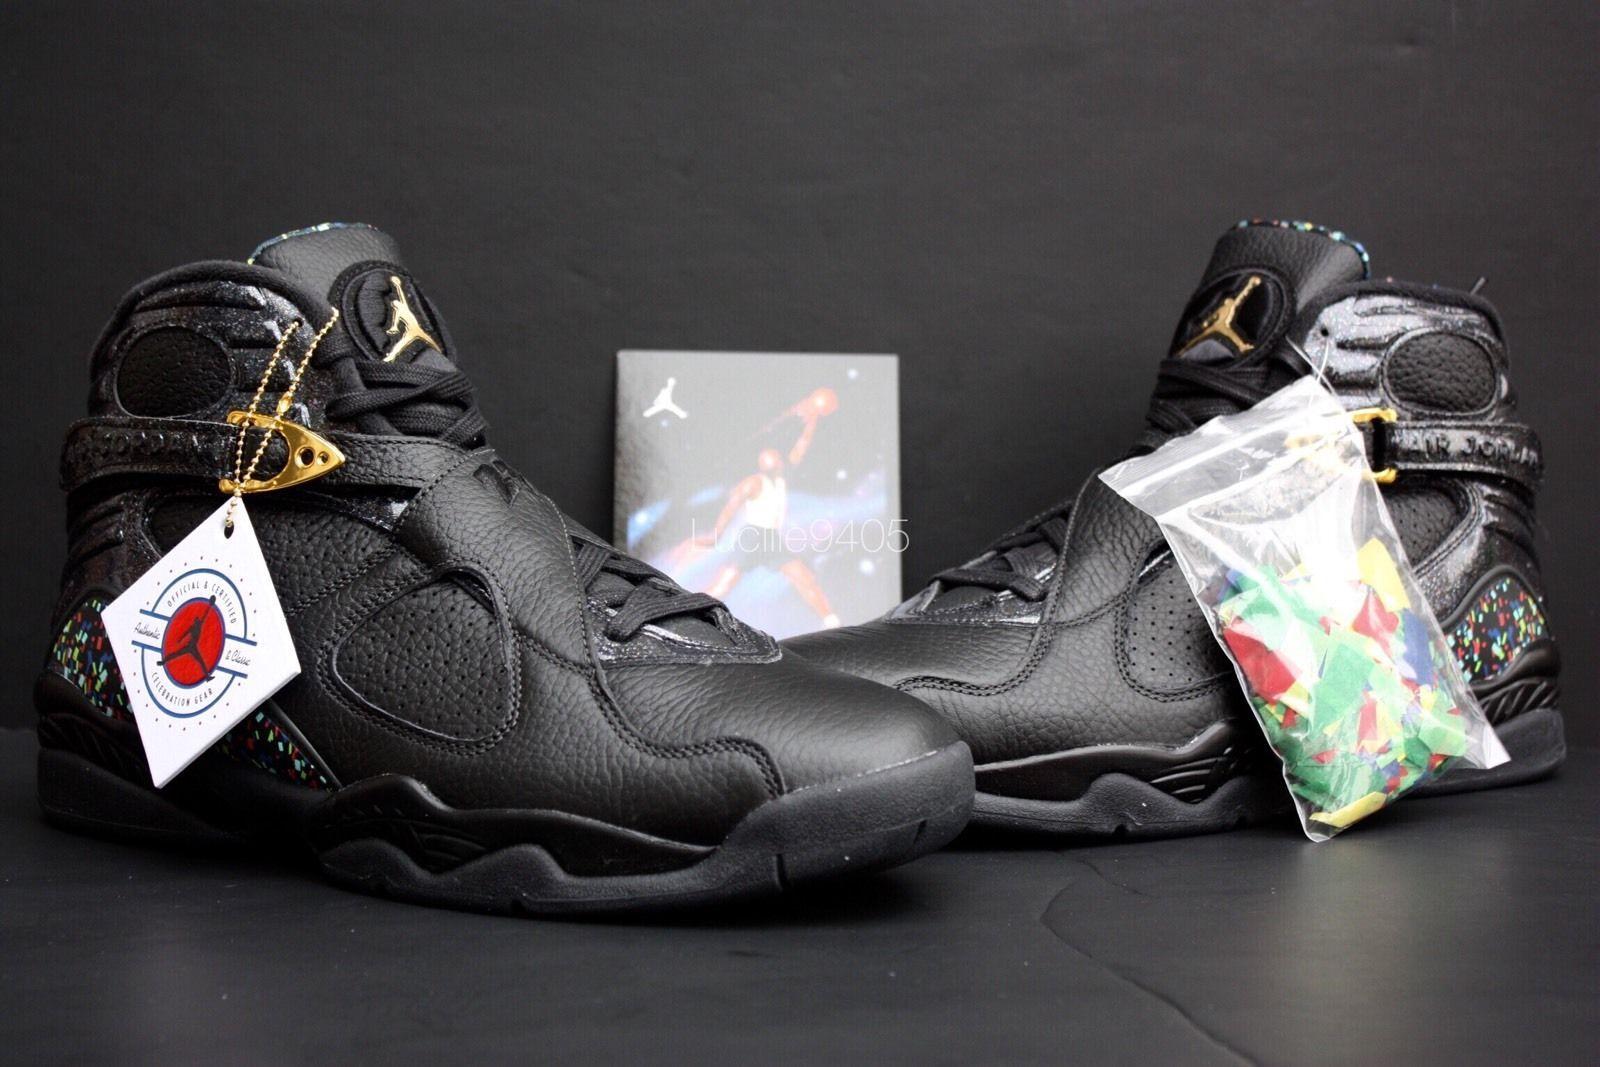 retro, Air jordans, Nike air jordan retro